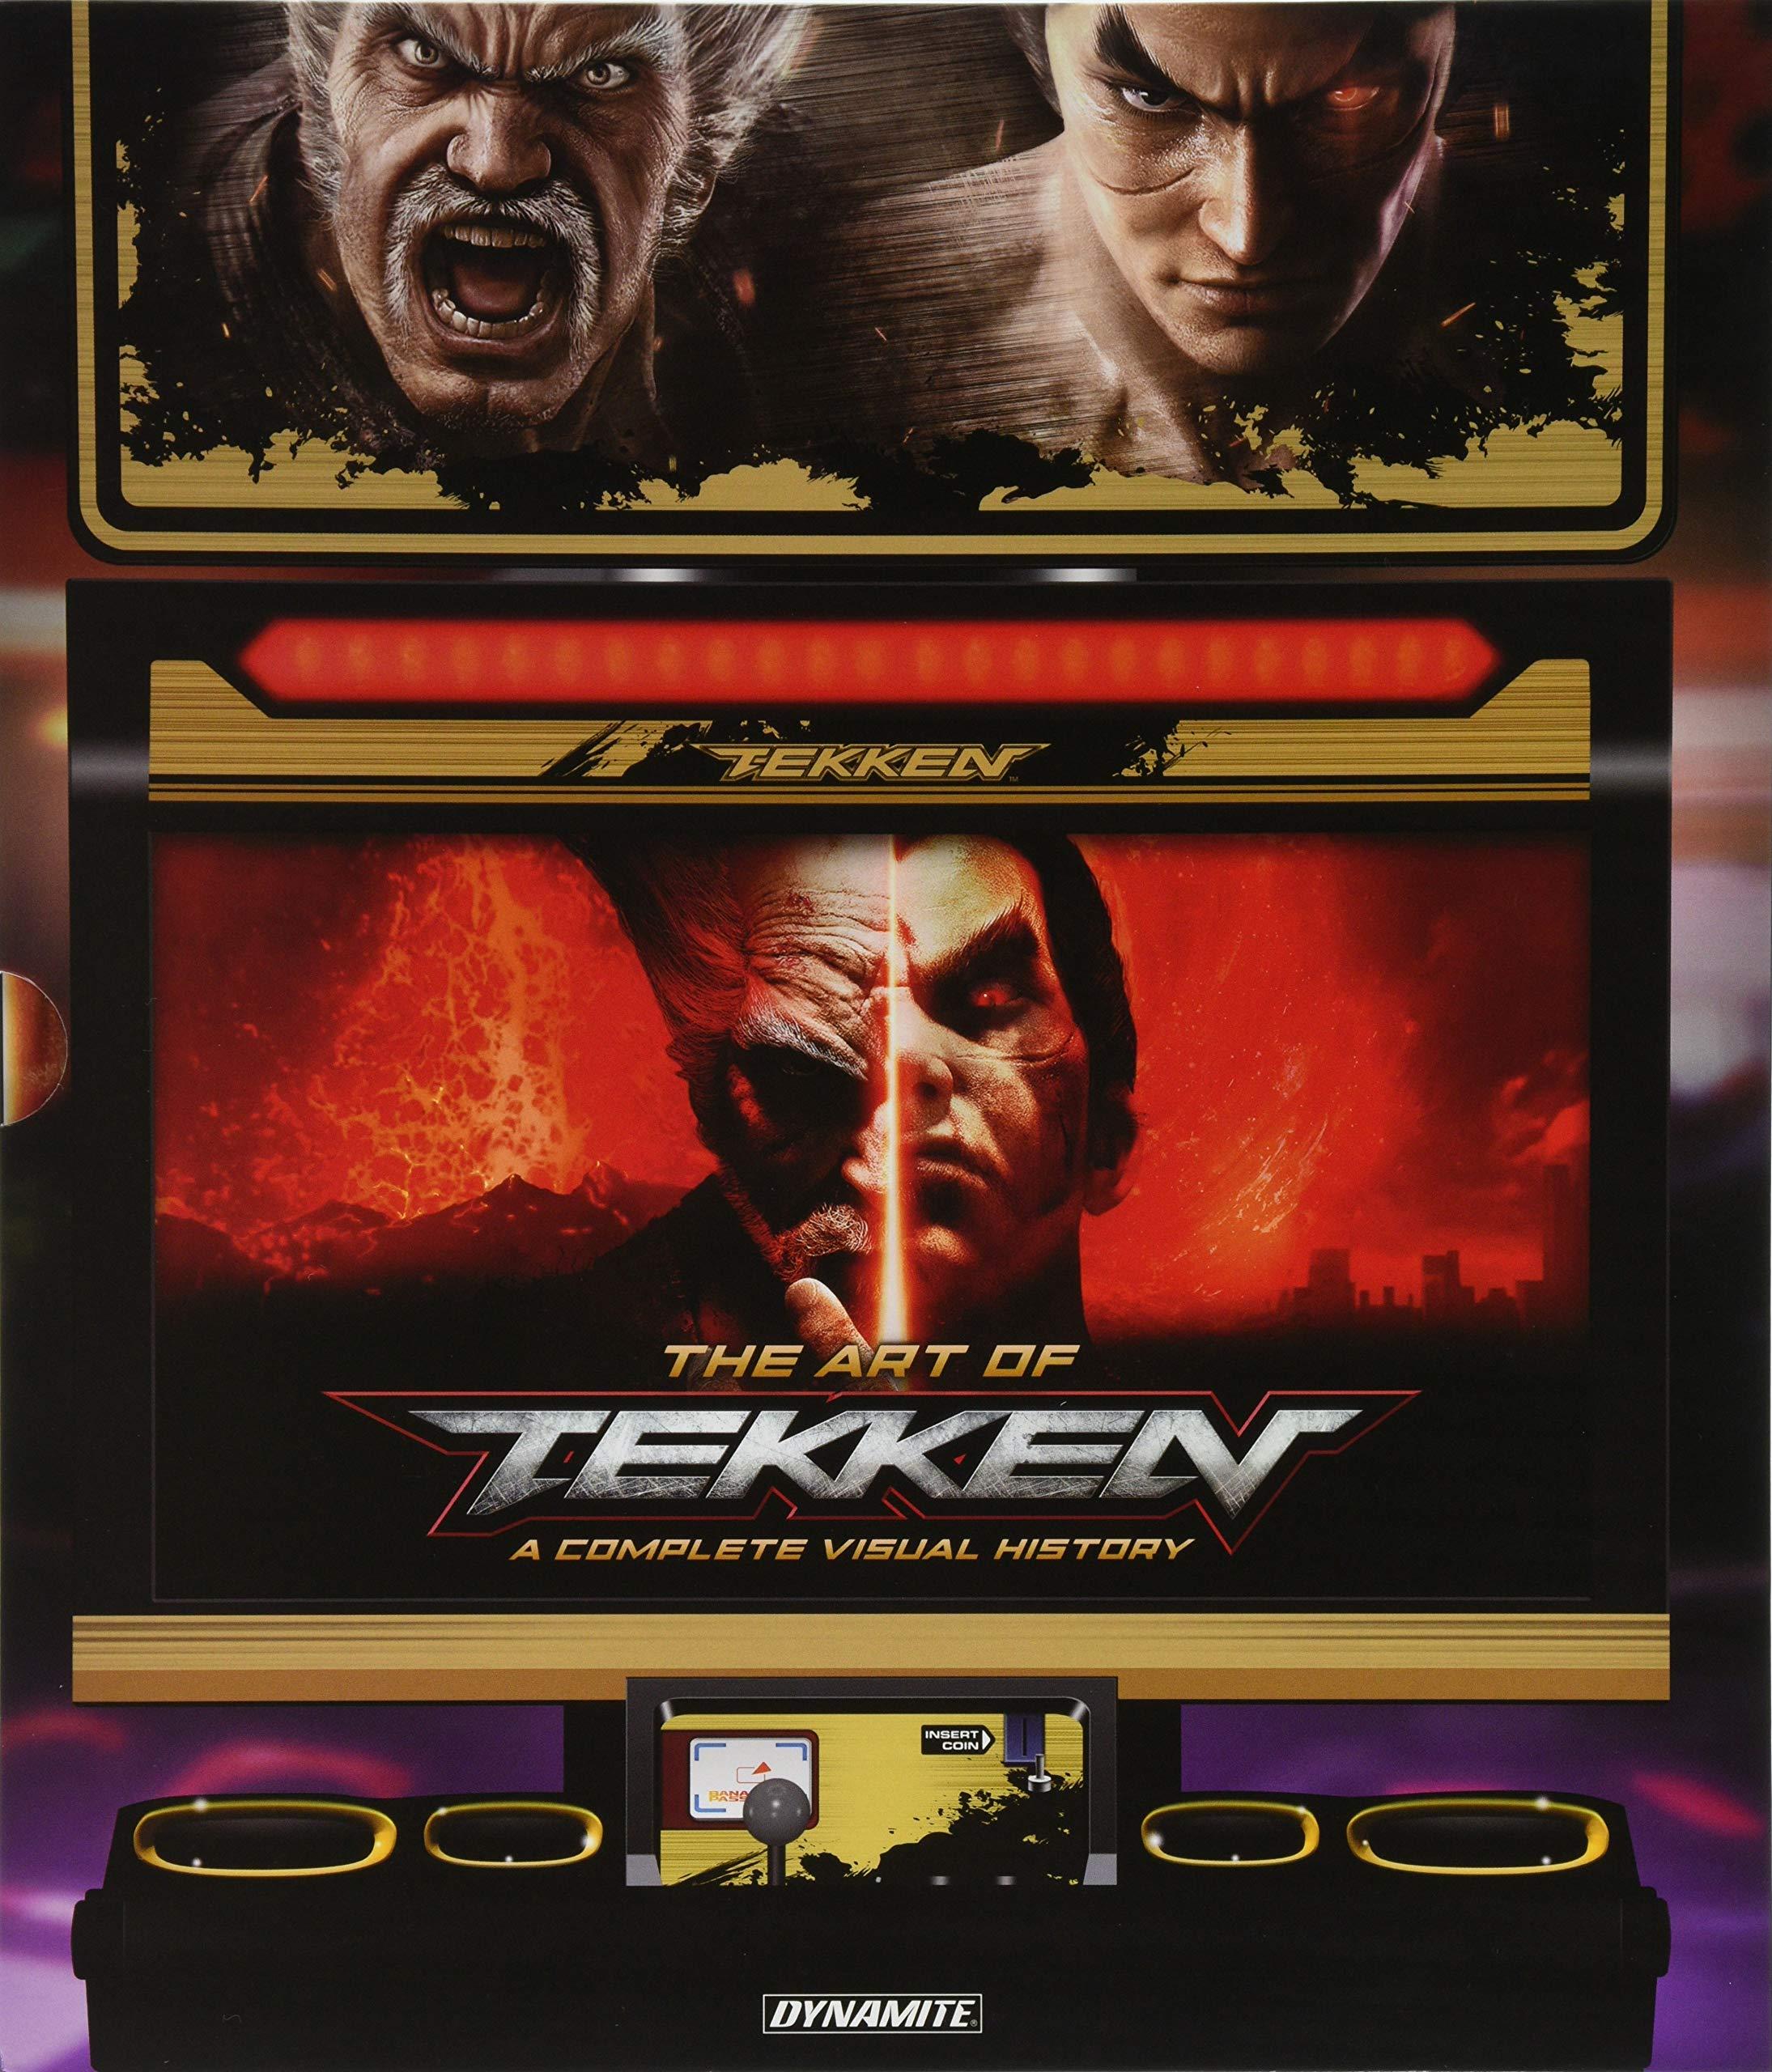 The Art of Tekken: The Complete Visual History HC Deluxe Edition: Amazon.es: Hull, Jerald, Smith, Elena A: Libros en idiomas extranjeros